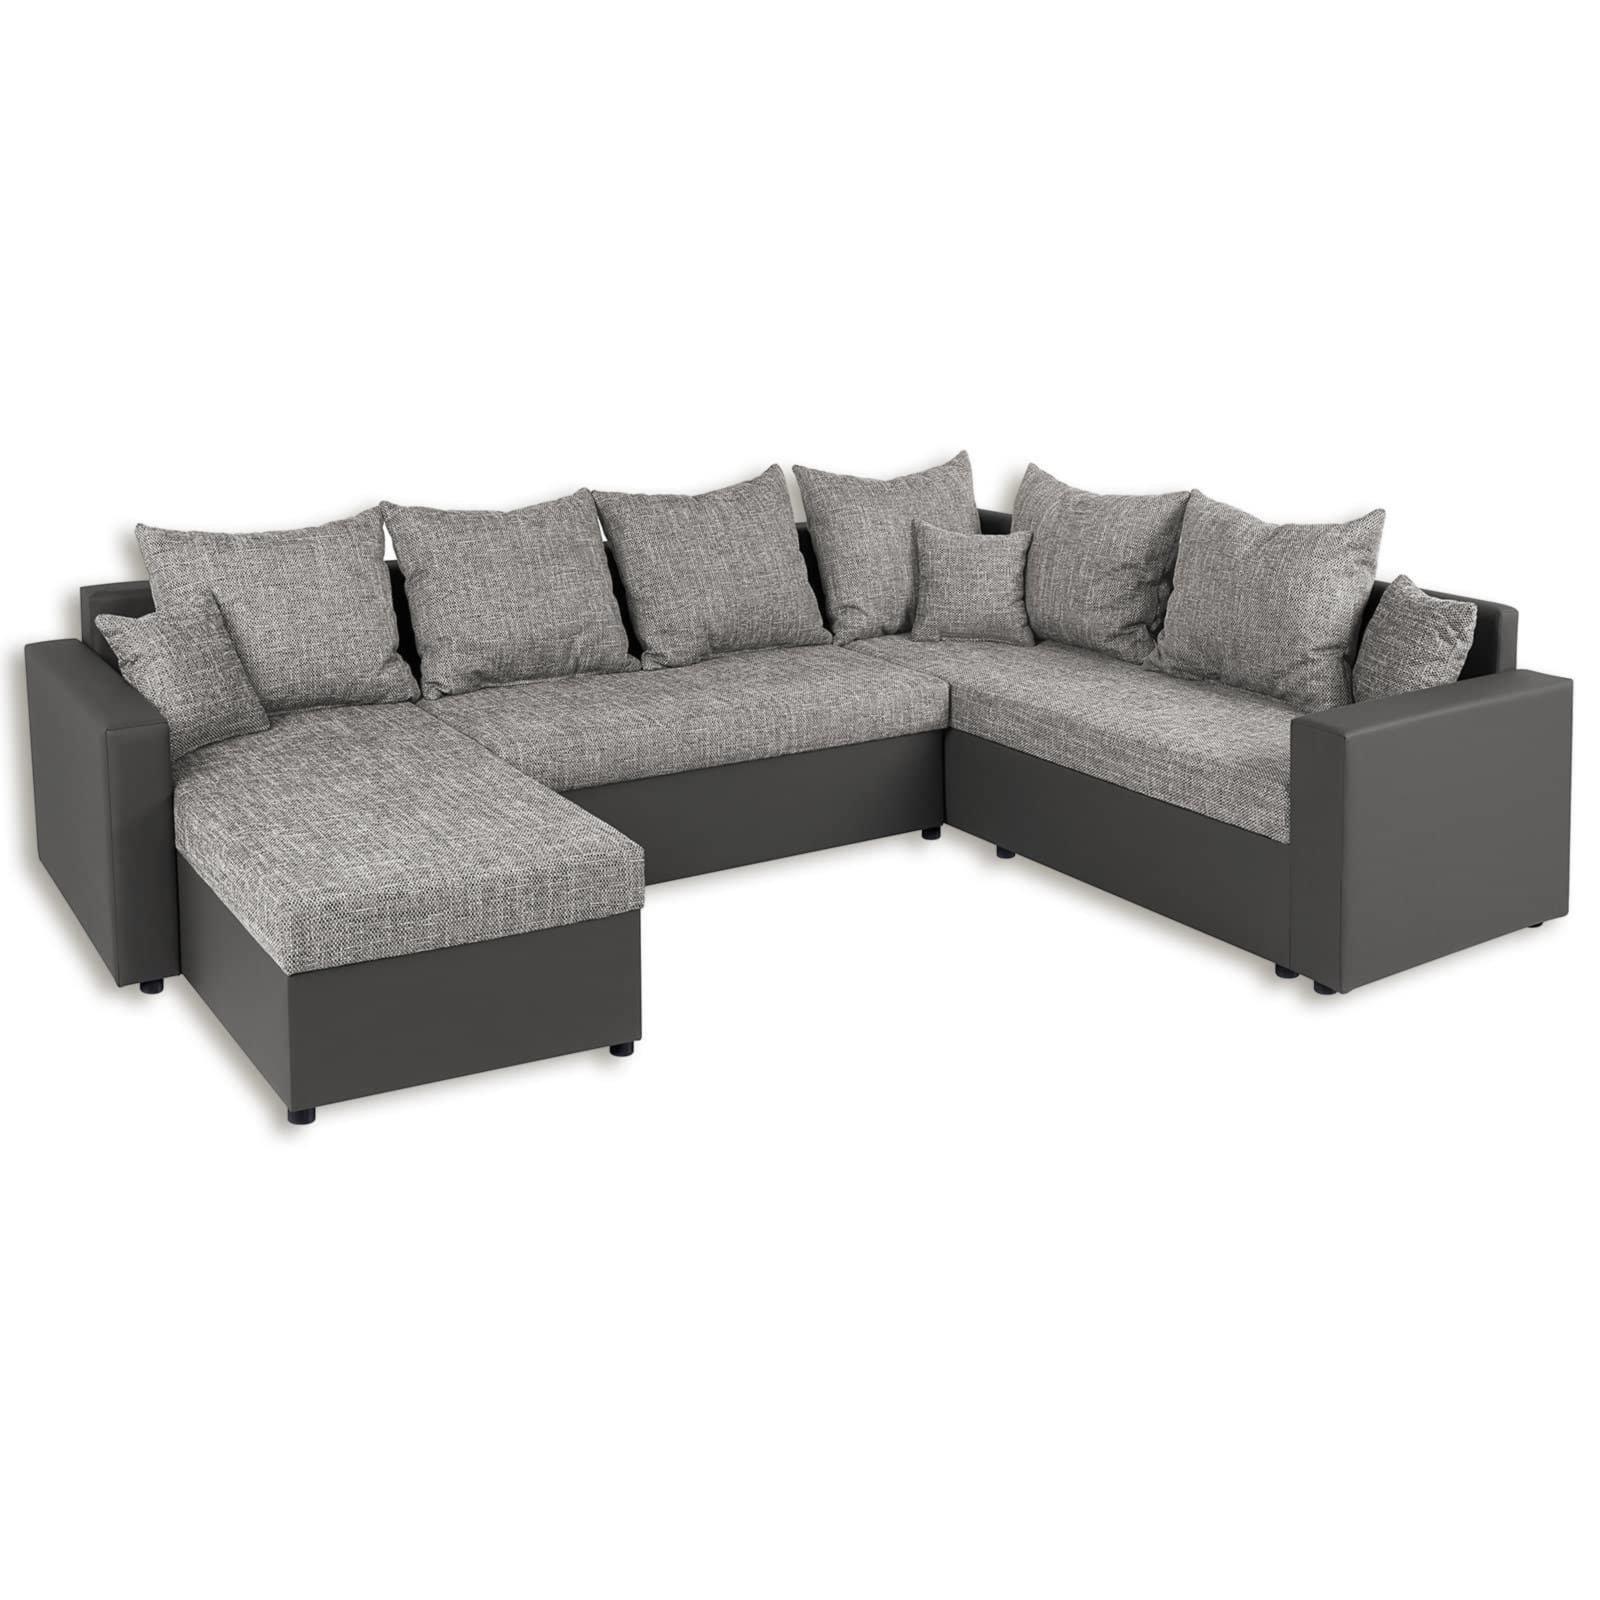 wohnlandschaft grau liegefunktion wohnlandschaften u. Black Bedroom Furniture Sets. Home Design Ideas